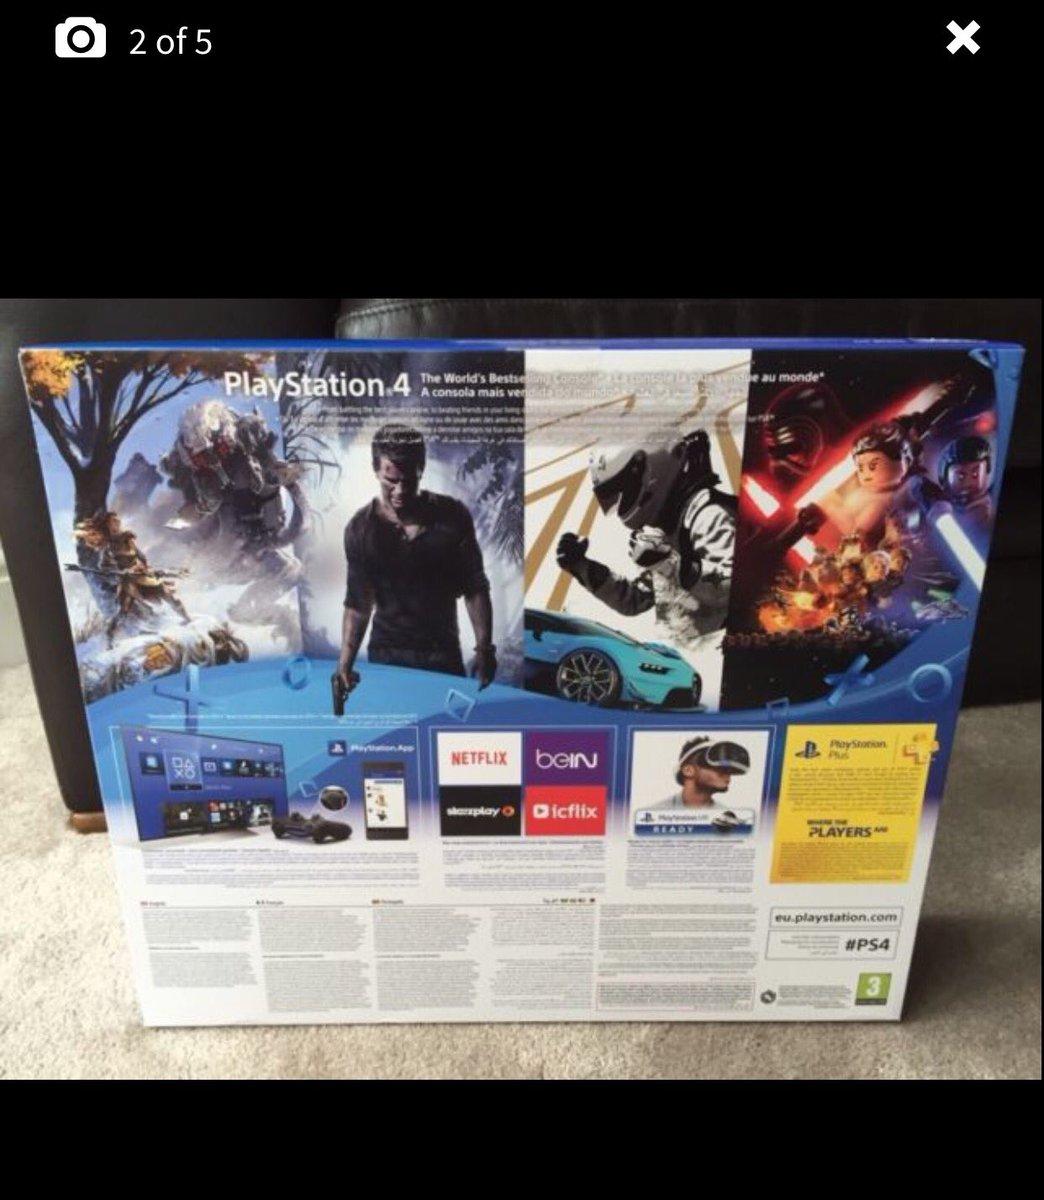 PS4 Slim 7